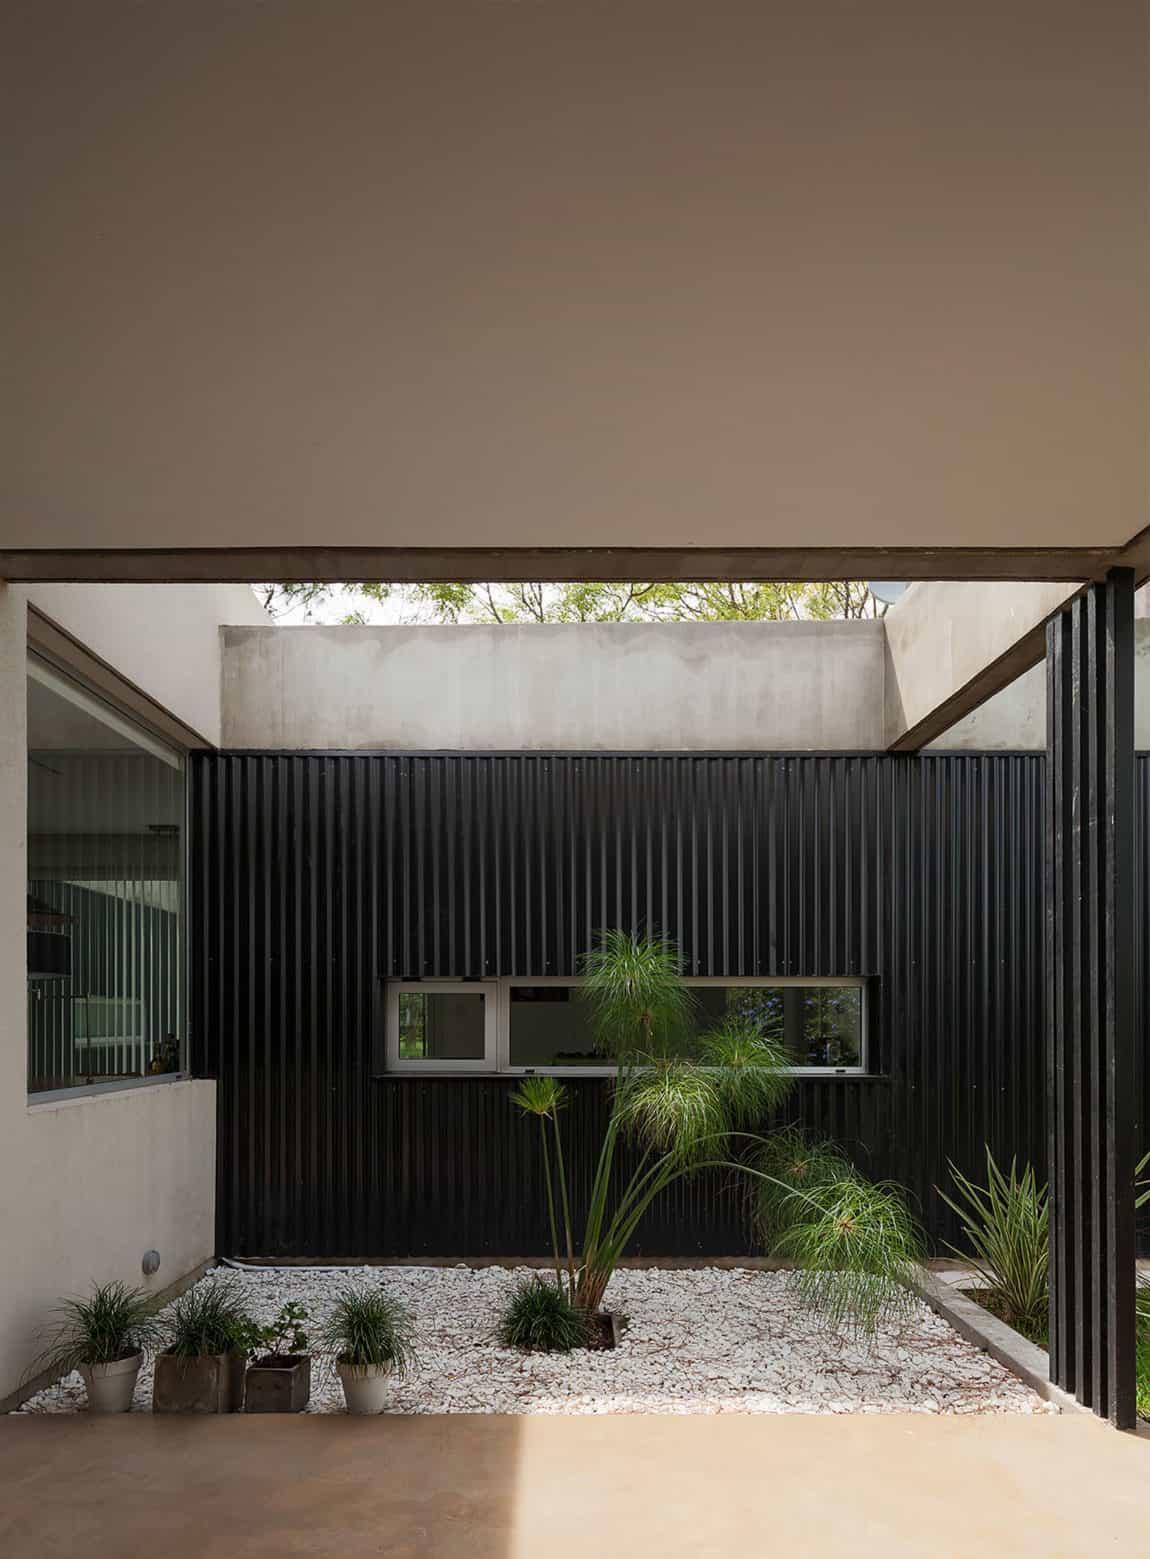 House in El Pinar by Nicolas Bechis (4)